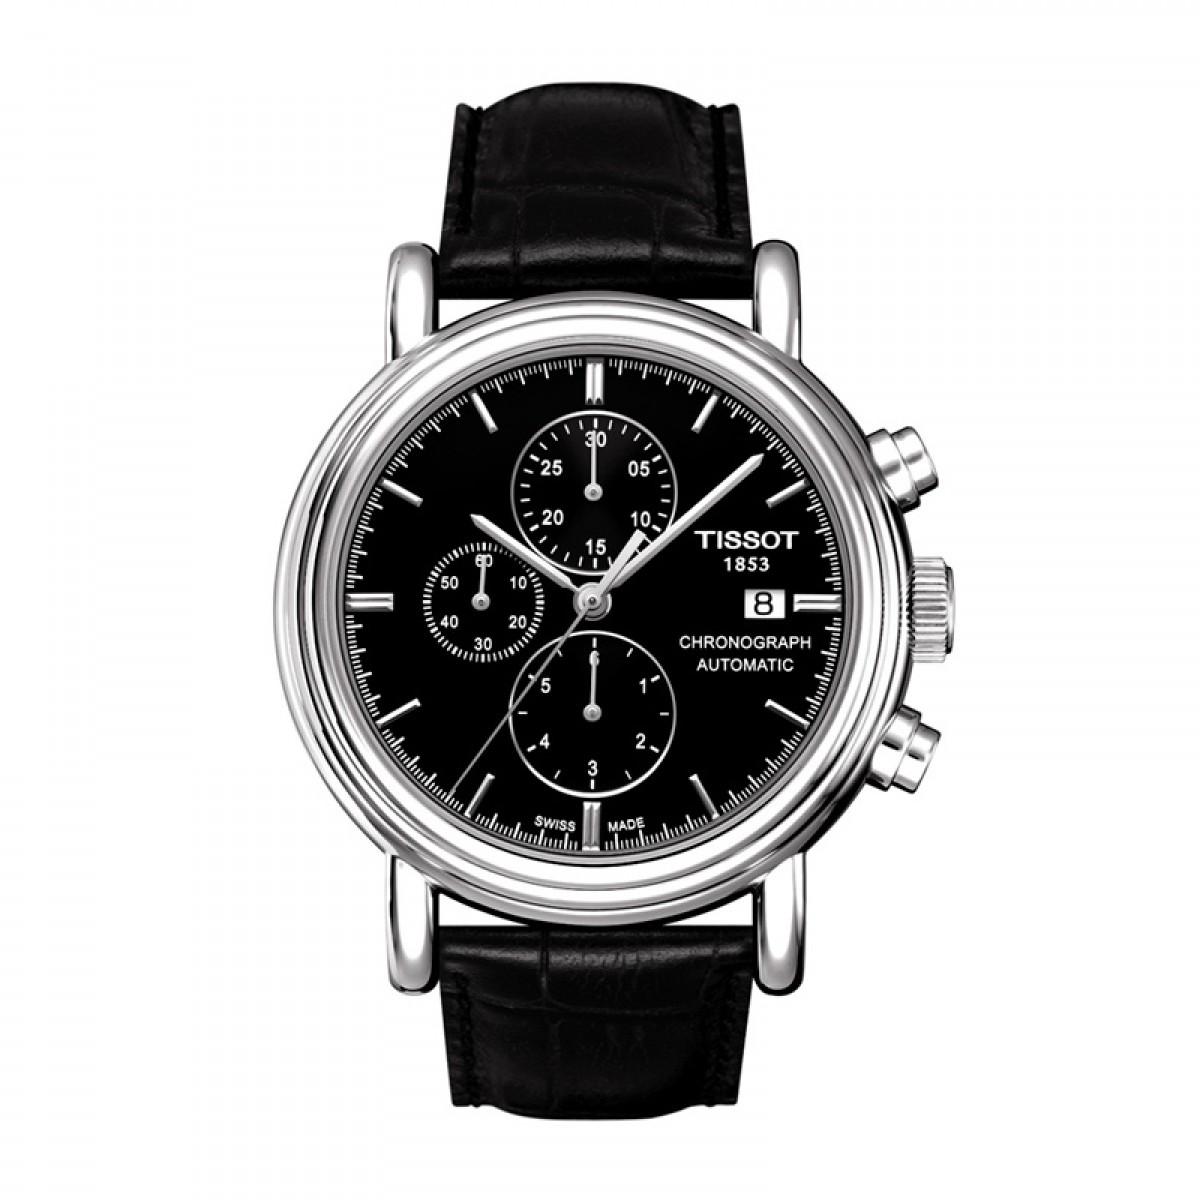 Часовник Tissot T068.427.16.051.00